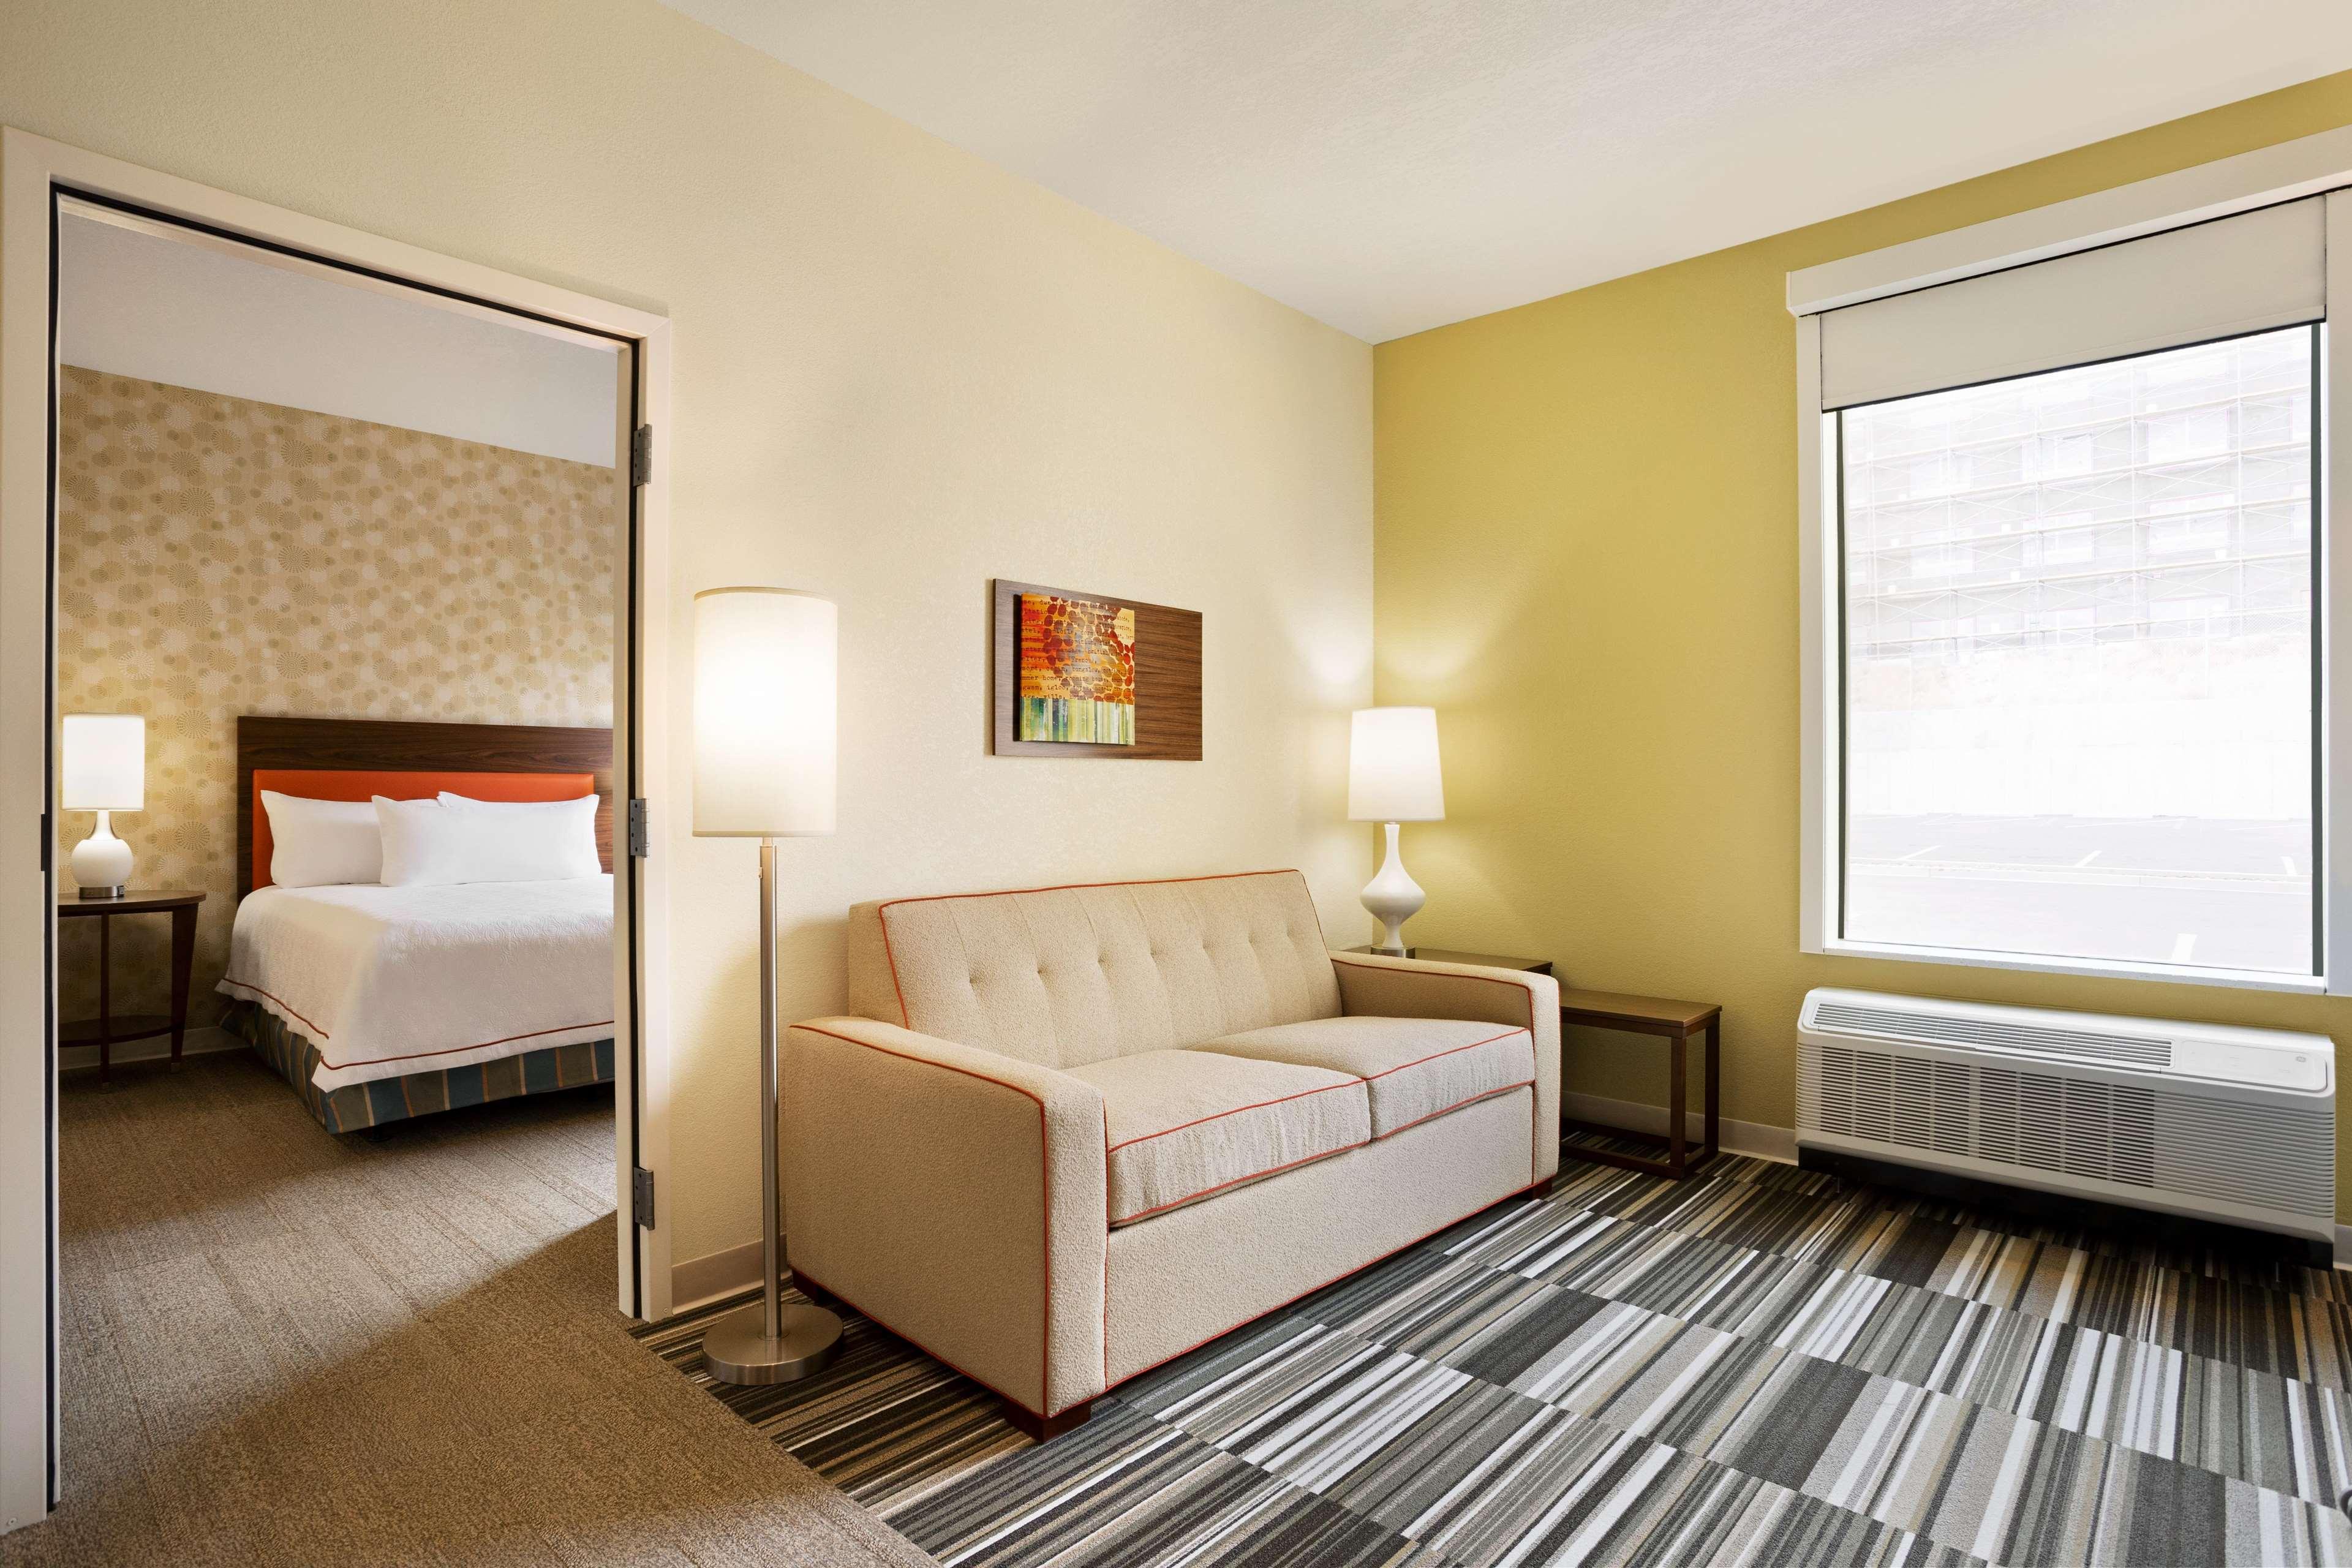 Home2 Suites by Hilton Elko image 28